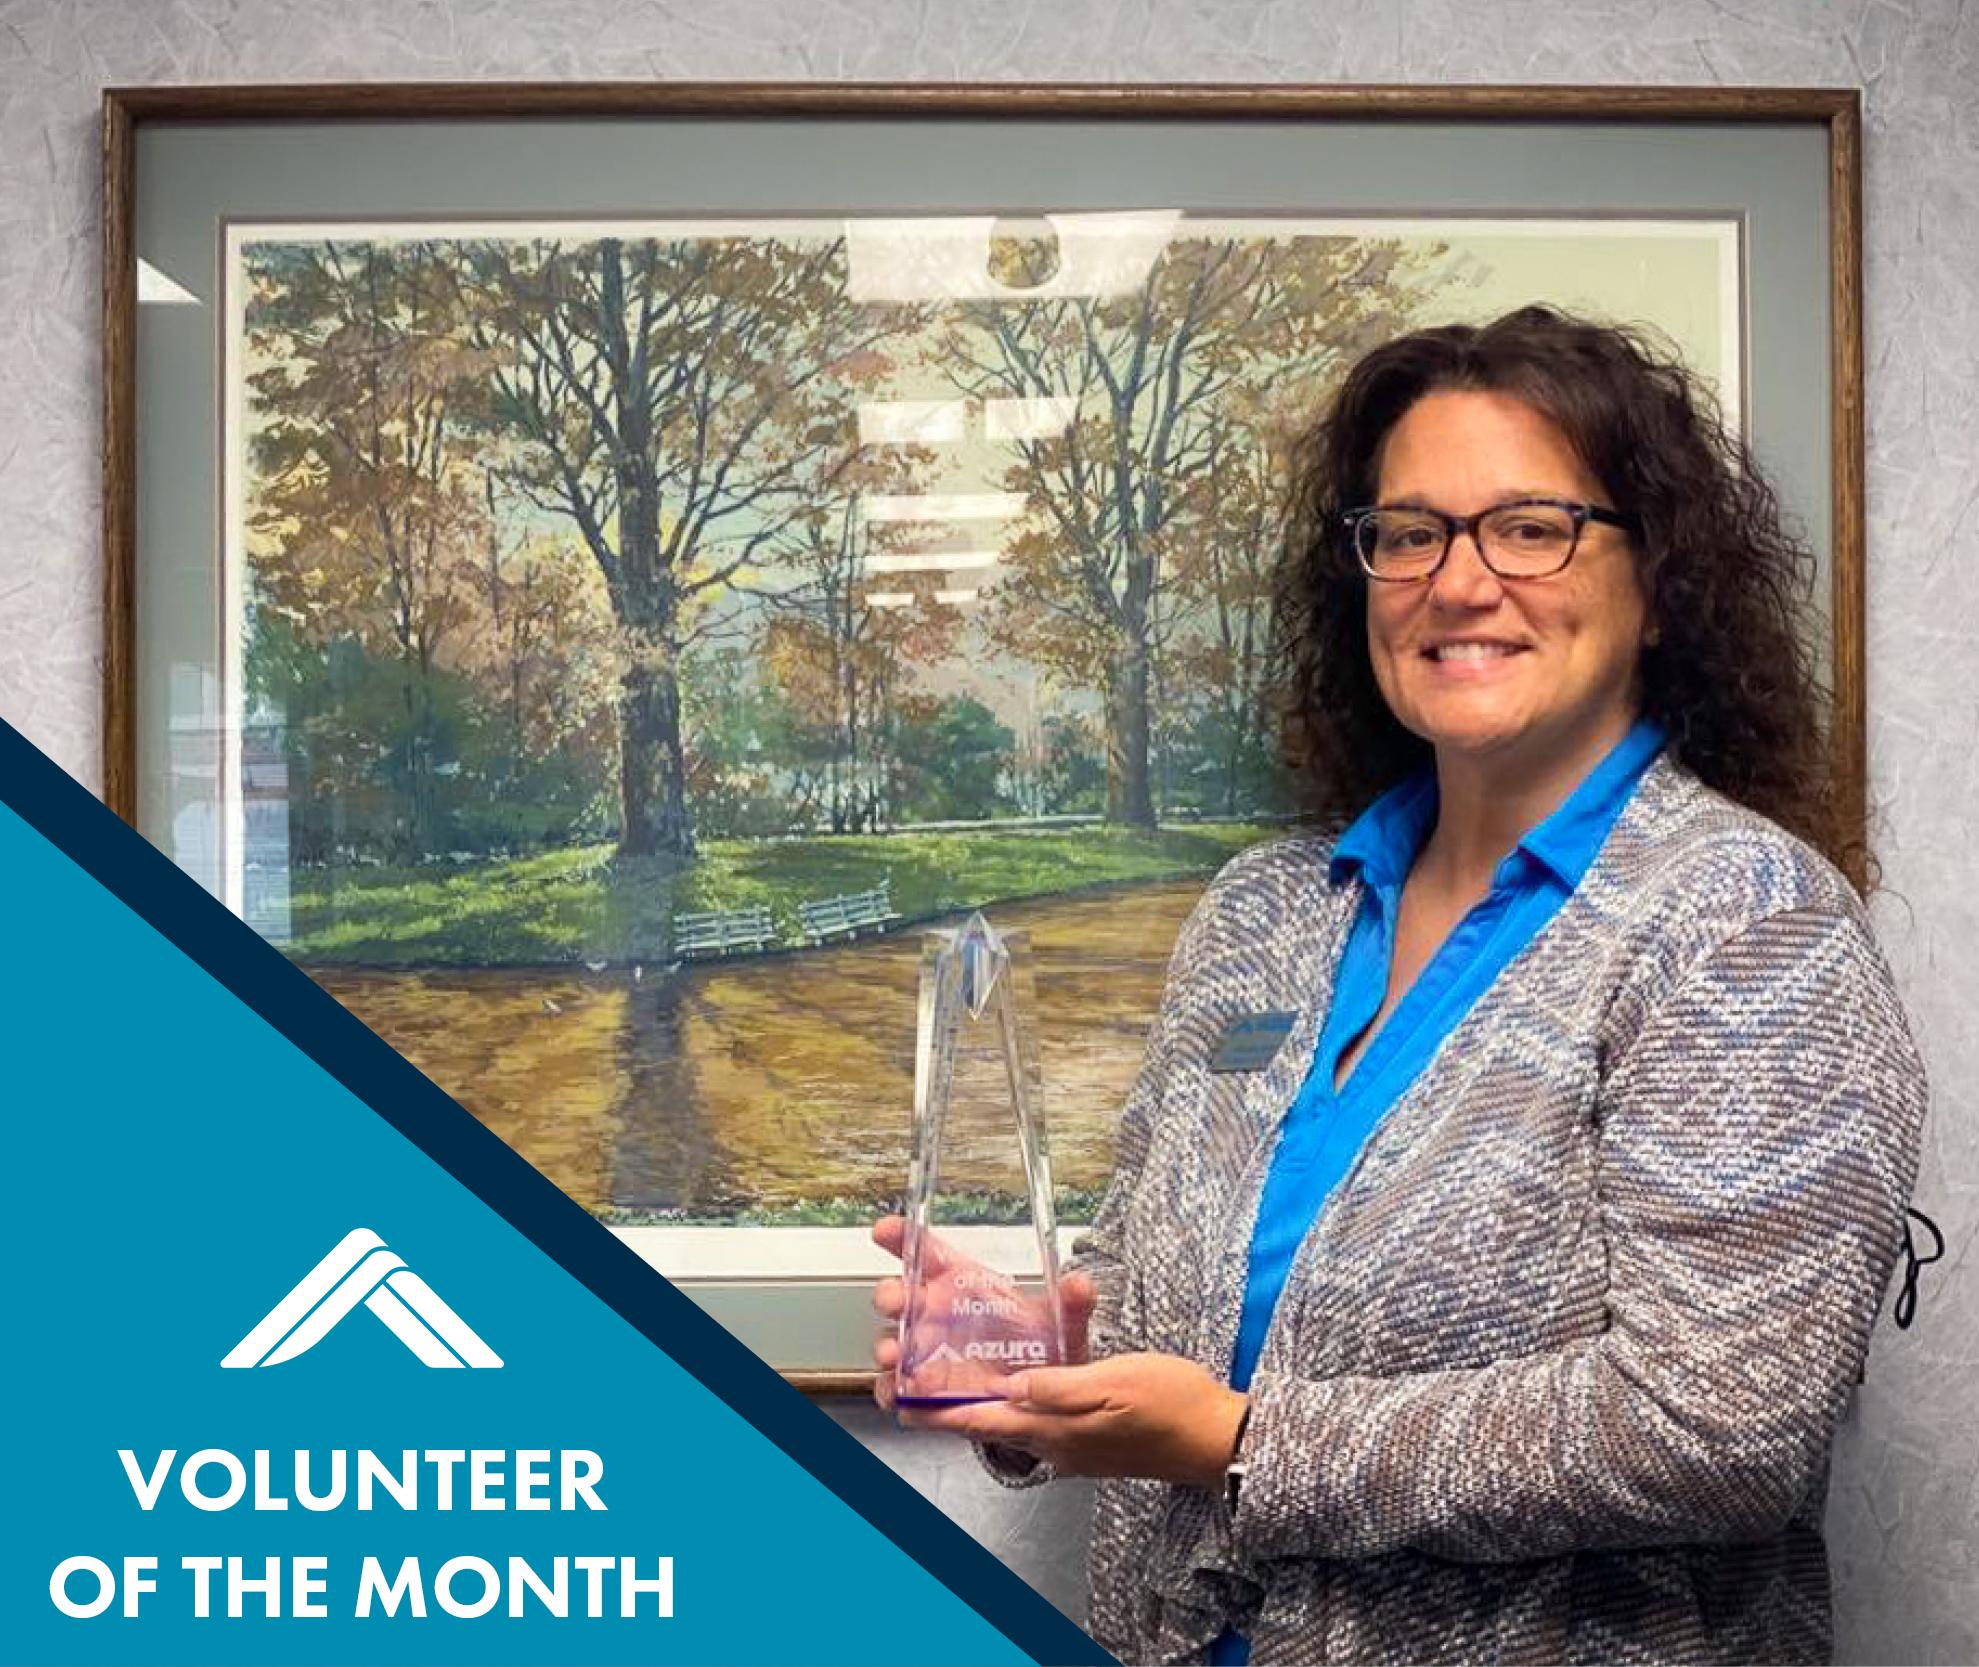 September Volunteer of the Month